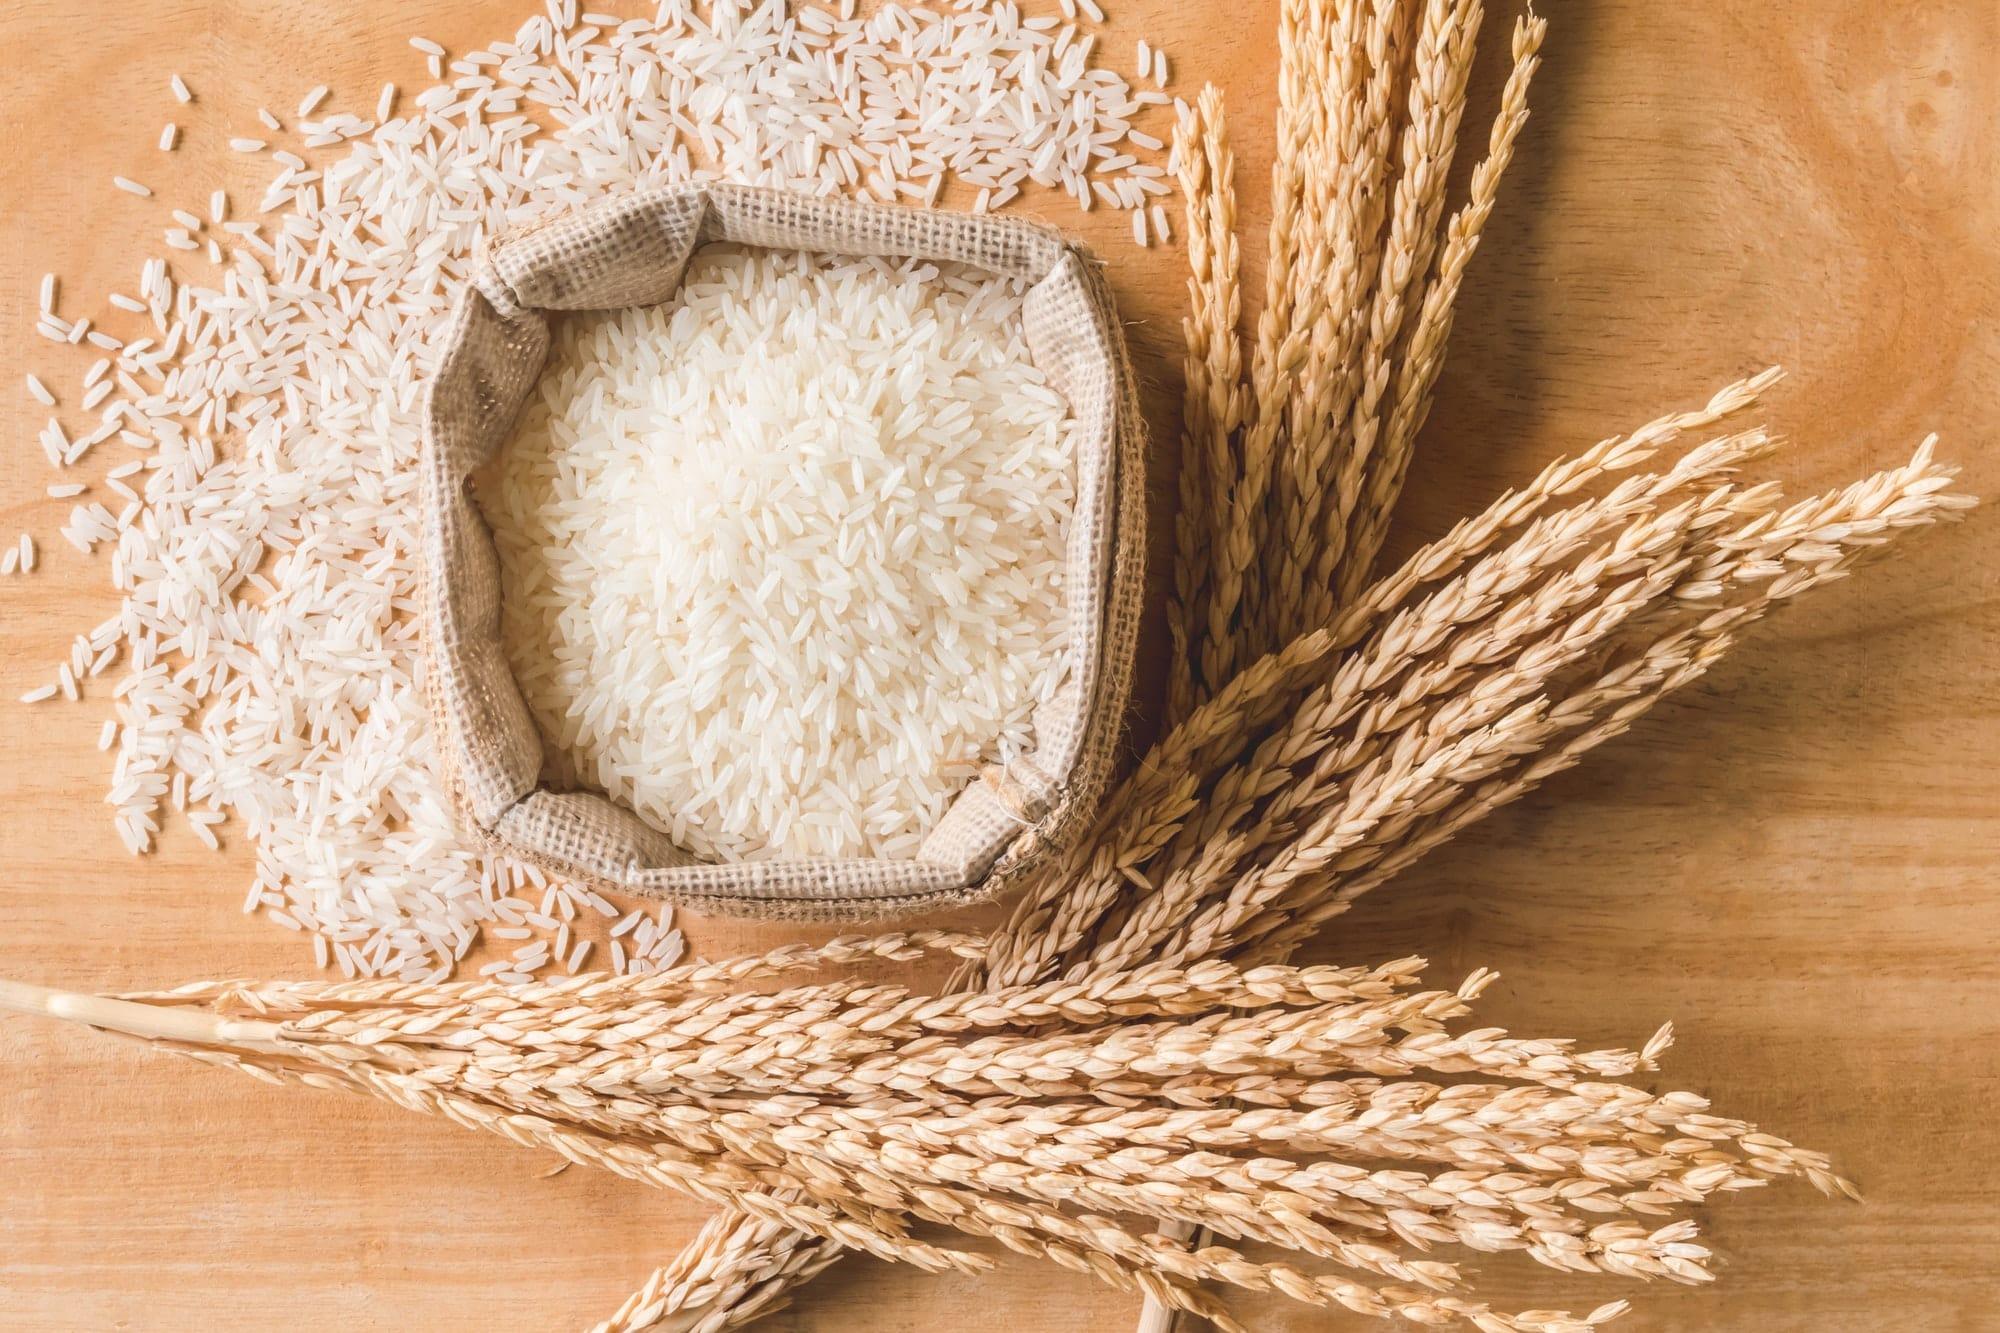 grains de riz crus dans un sac